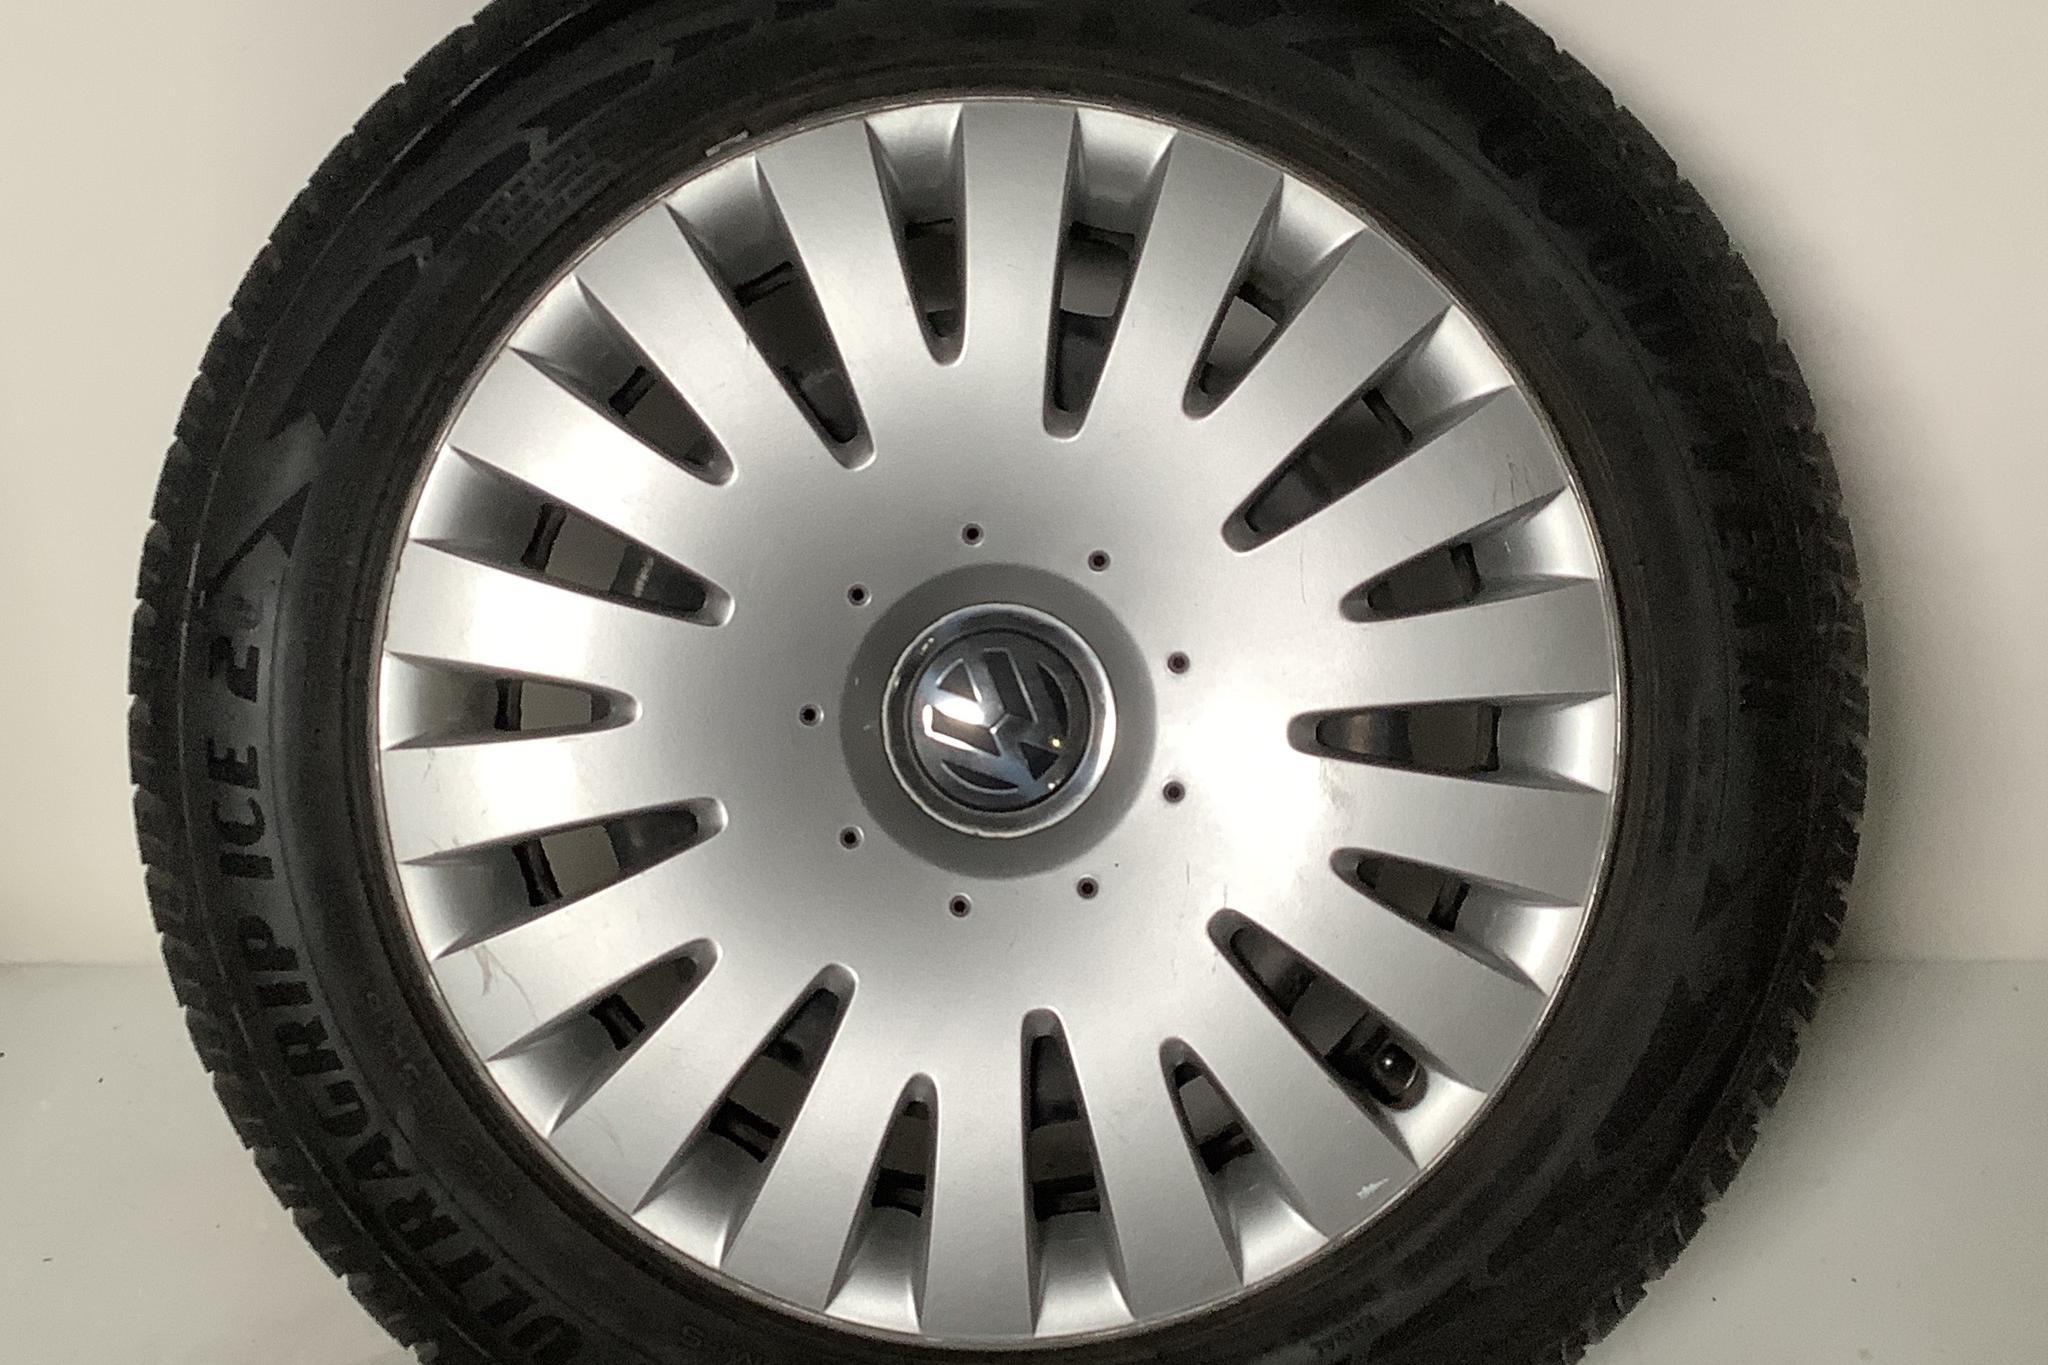 VW Passat 2.0 TDI BlueMotion Technology Variant (170hk) - 133 650 km - Automatic - Dark Grey - 2011